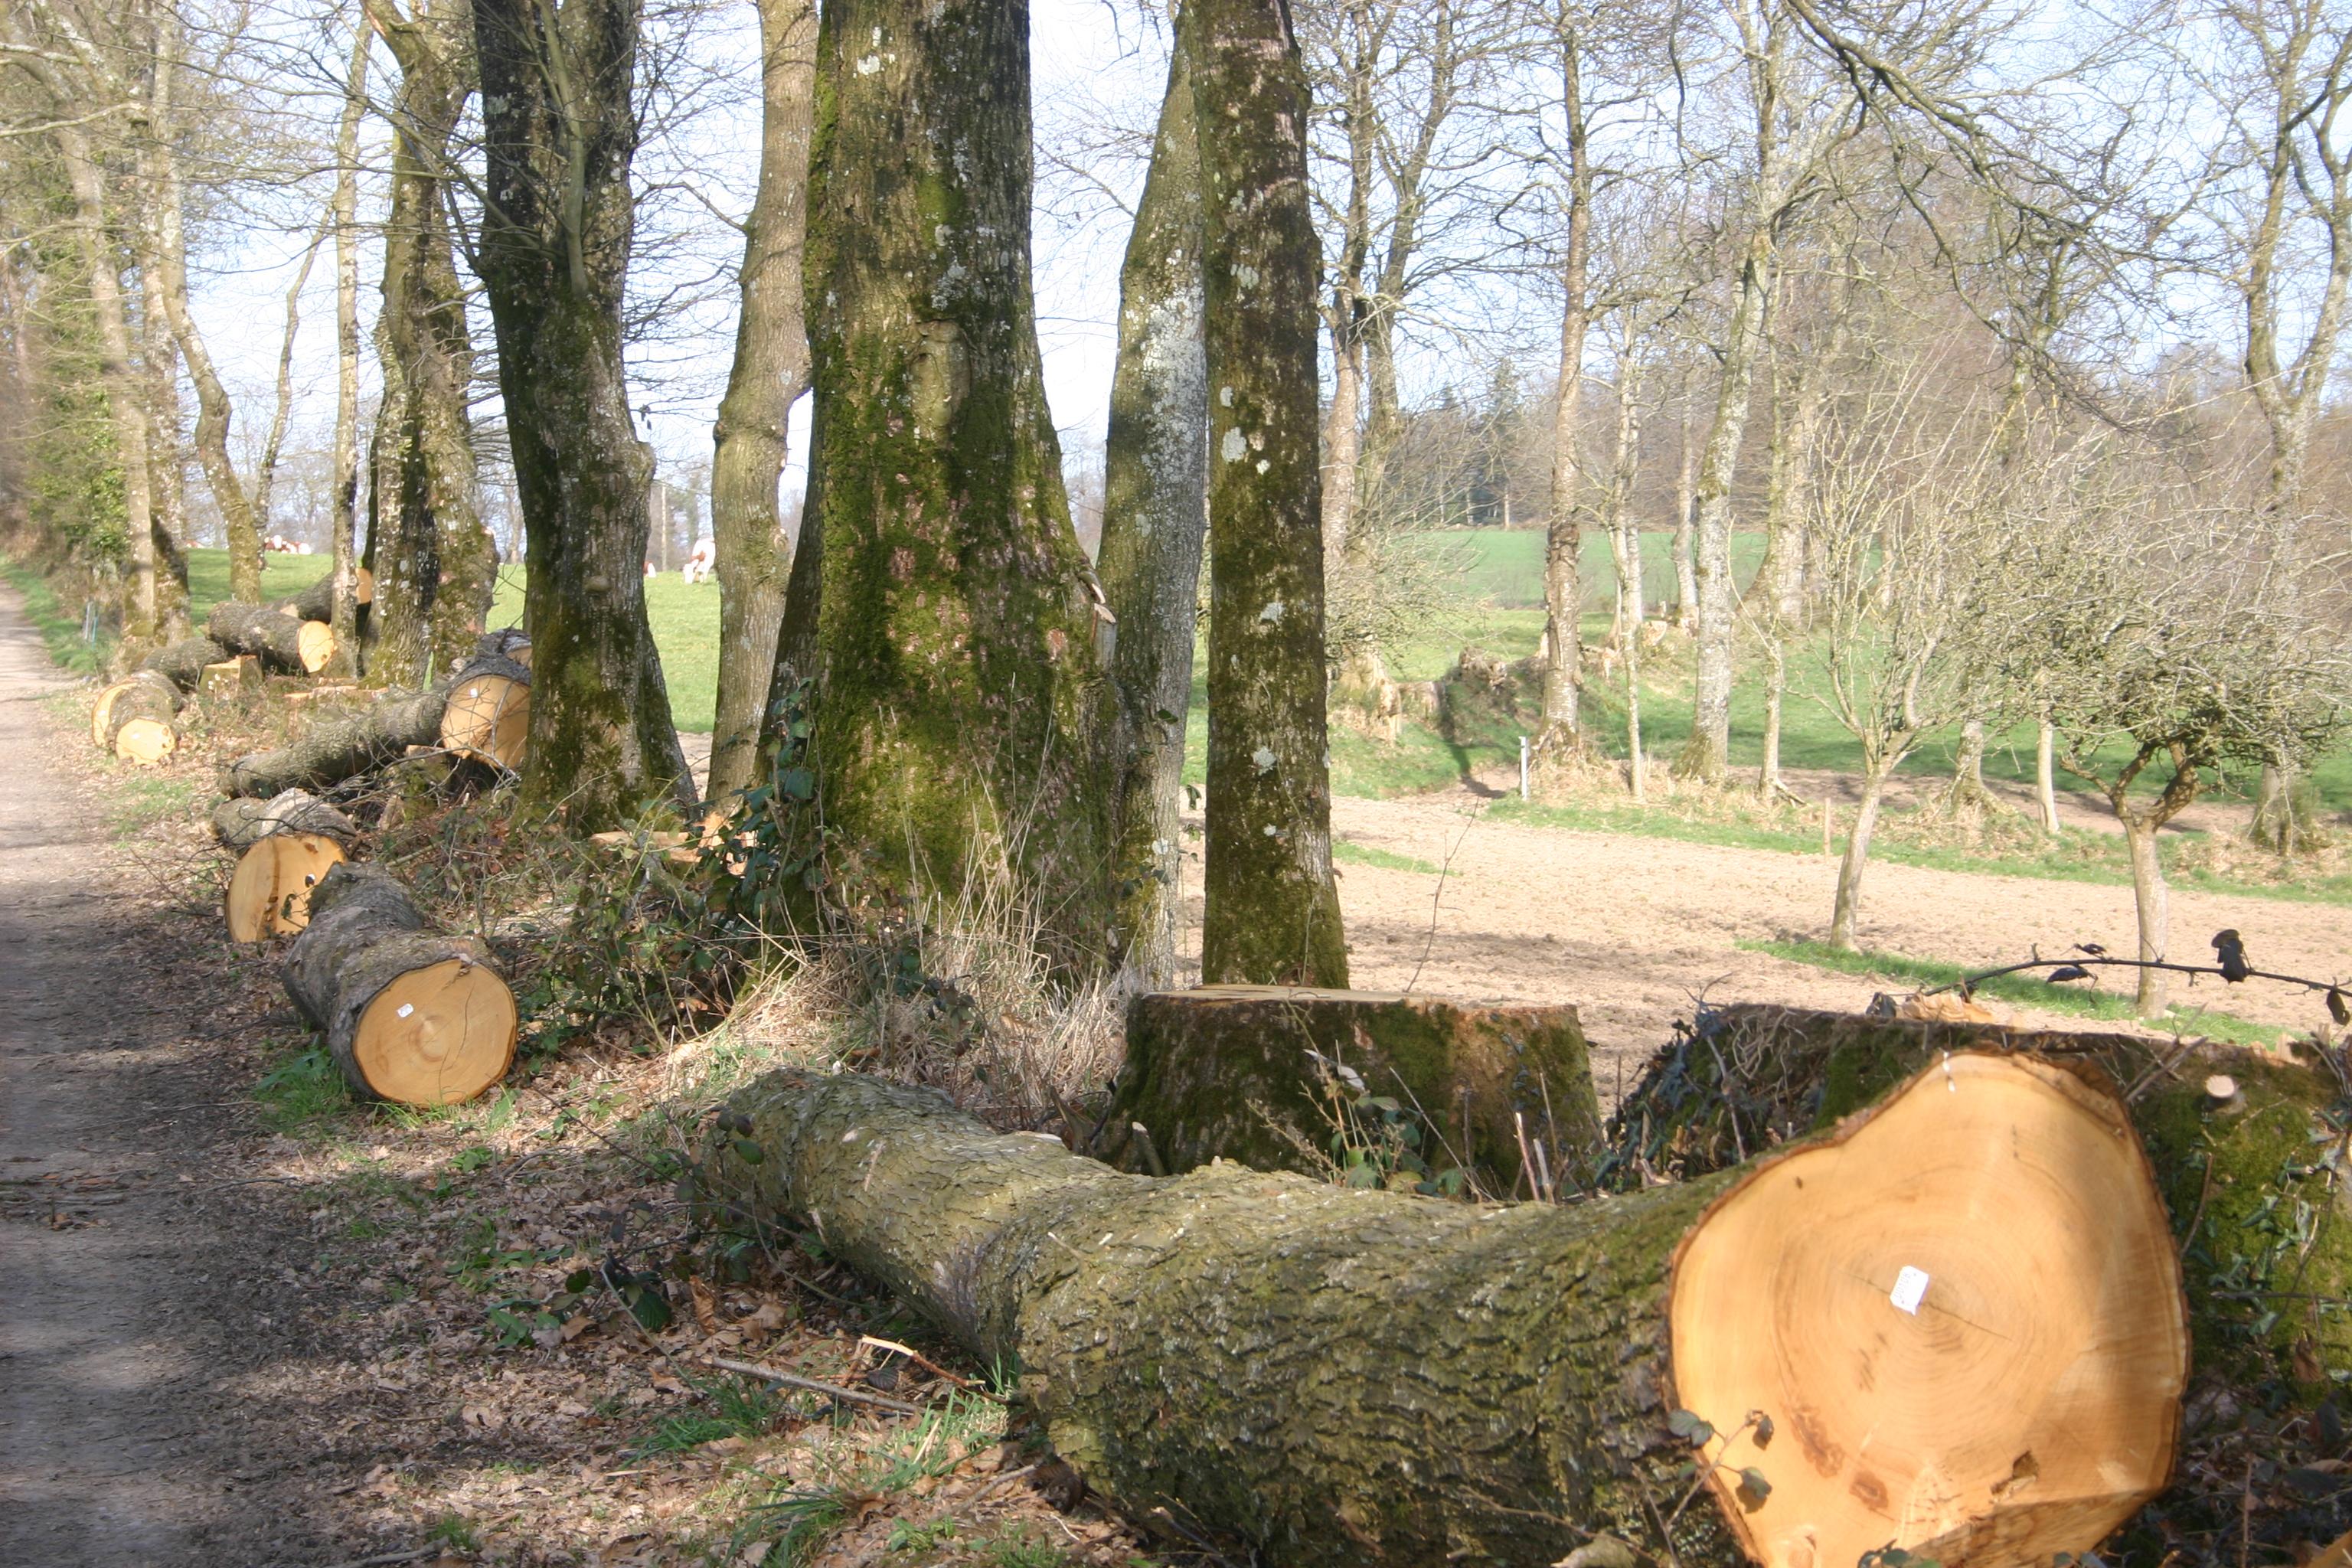 FileBille de bois de châtaignier fraichement abattujpg  Wikimedia  ~ Bille De Bois Synonyme